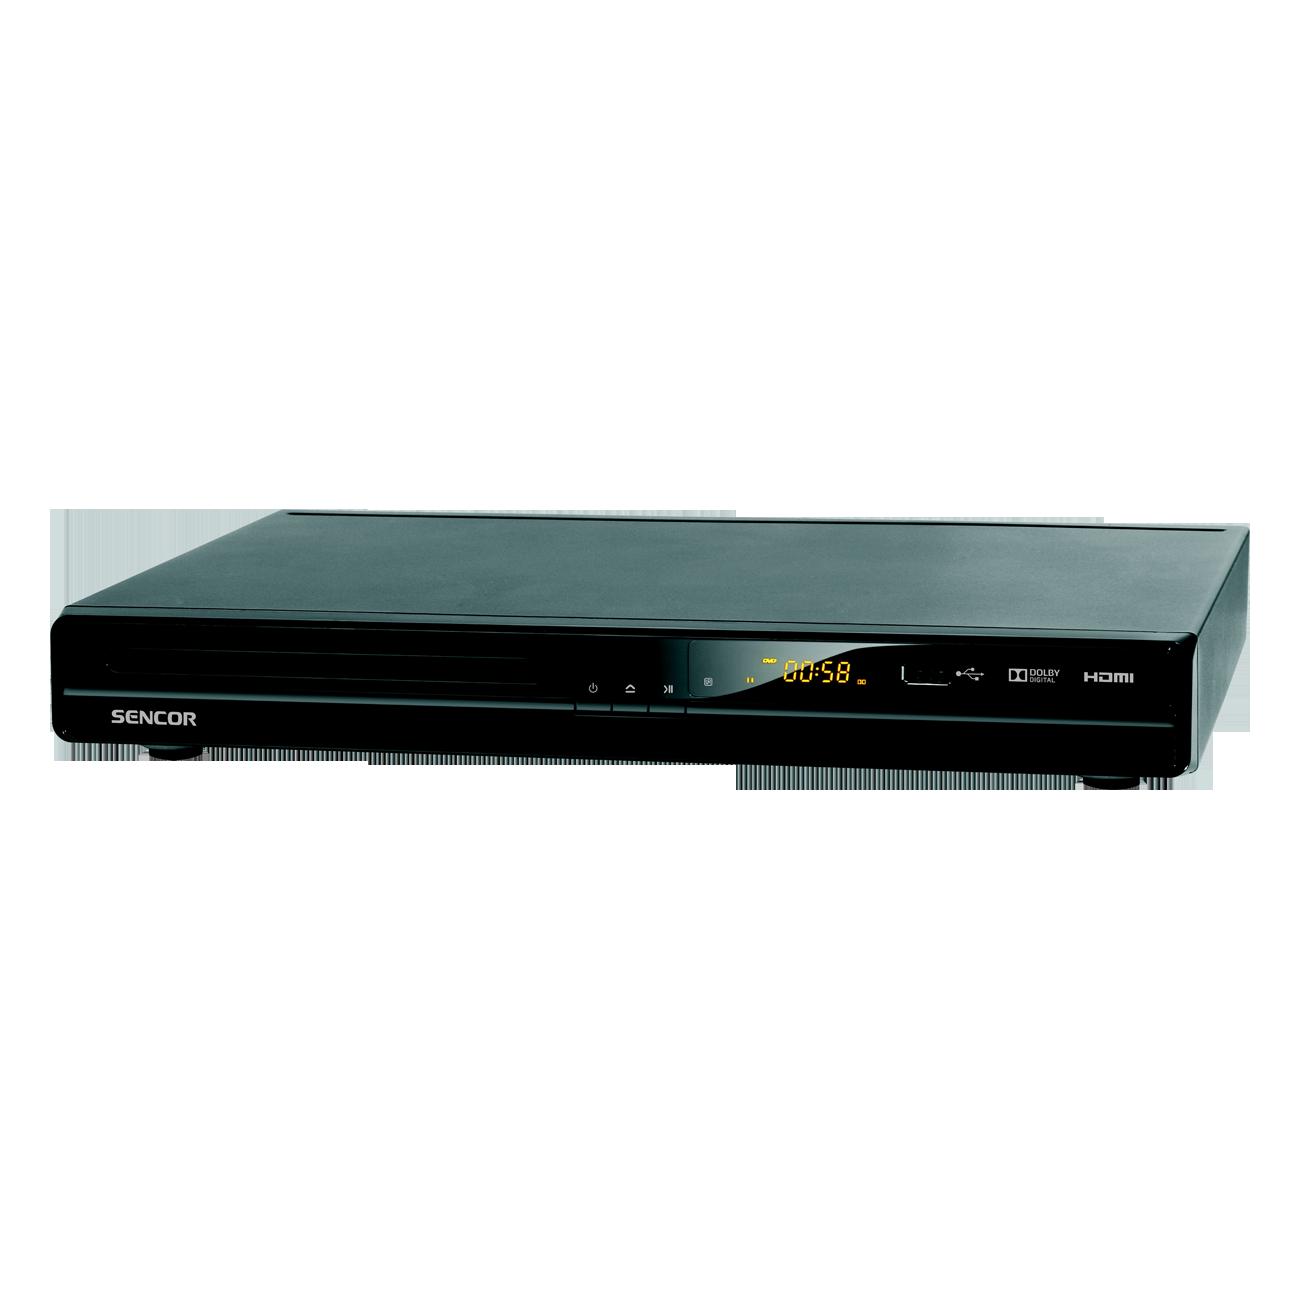 Sencor SDV 7306H